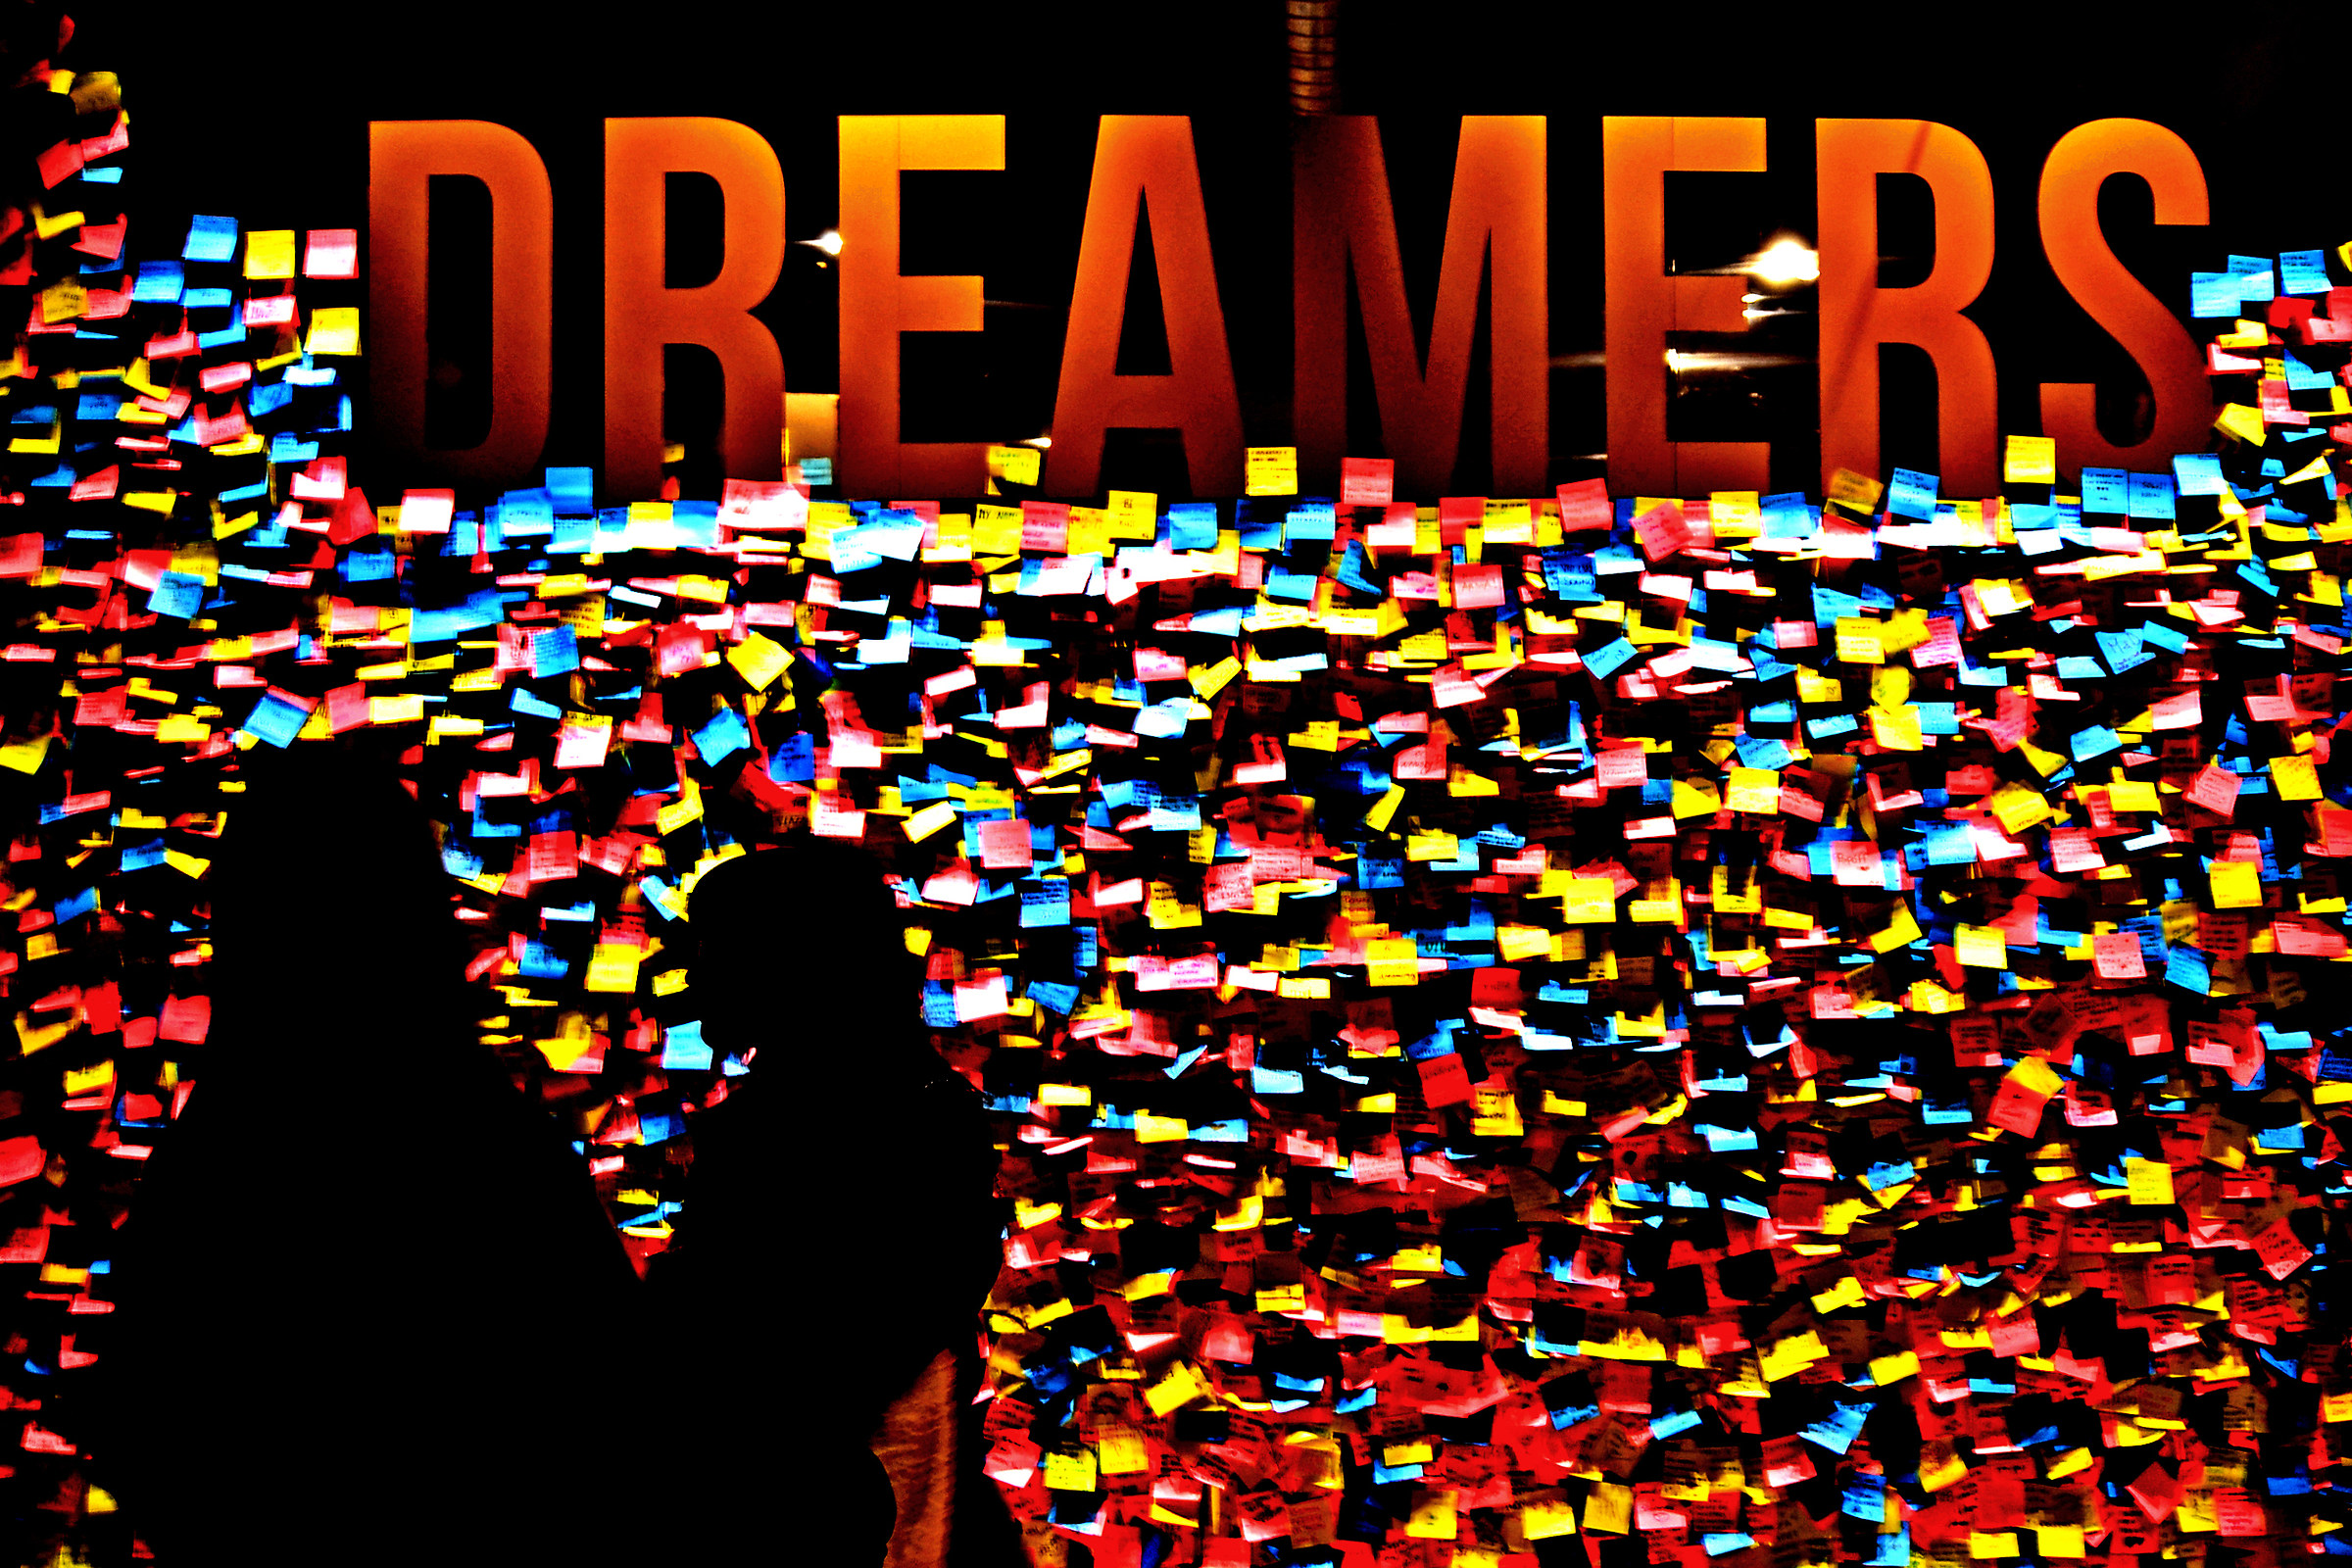 Dreamers...